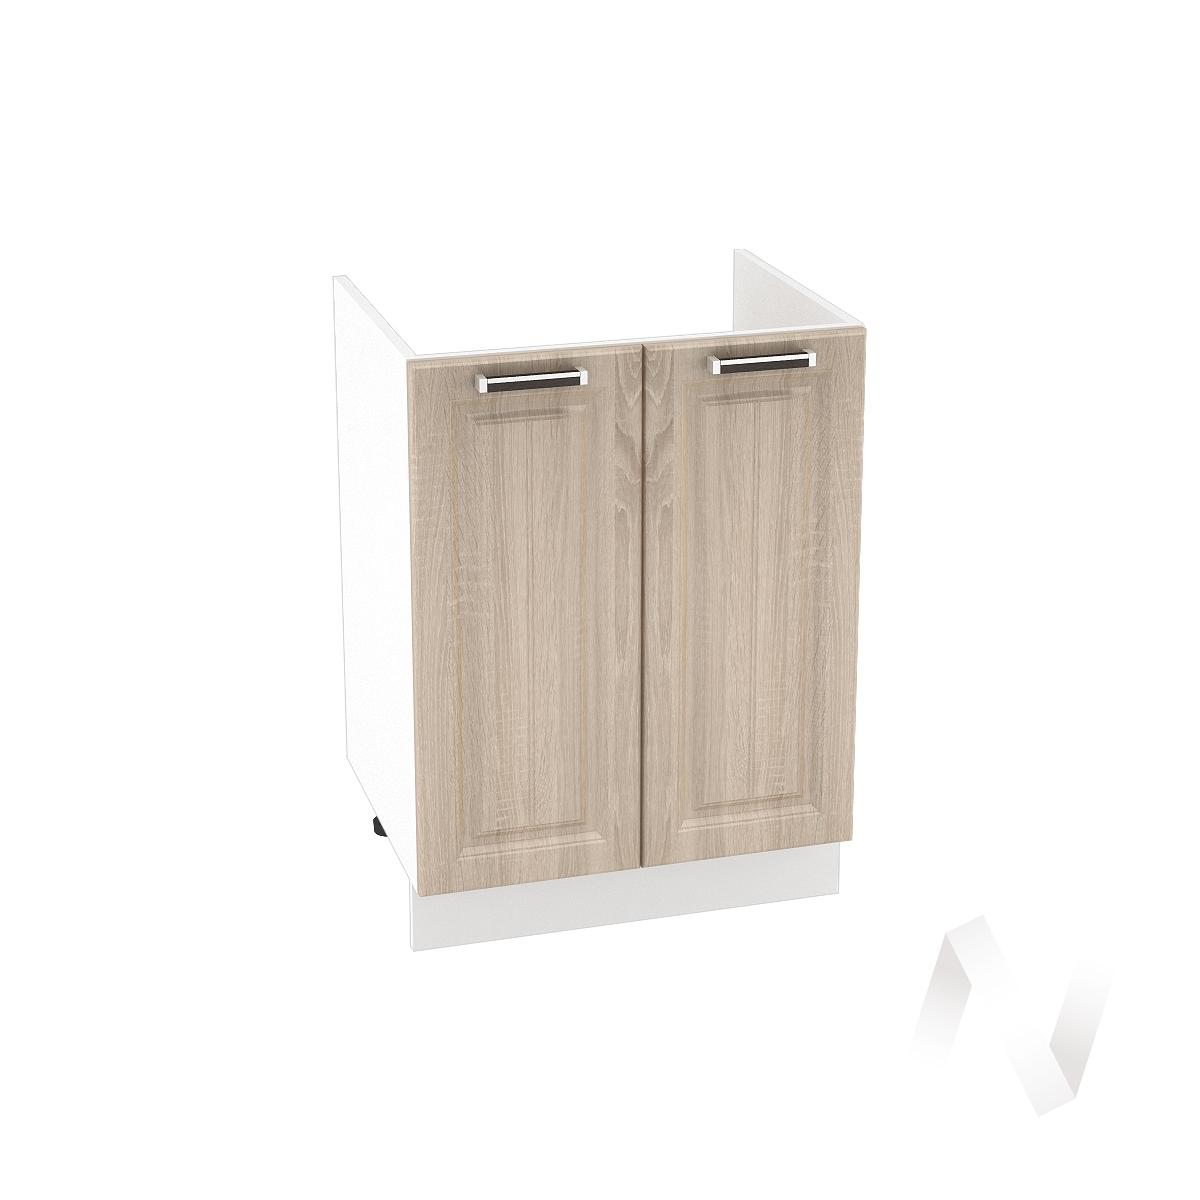 "Кухня ""Прага"": Шкаф нижний под мойку 600, ШНМ 600 новый (дуб сонома/корпус белый)"